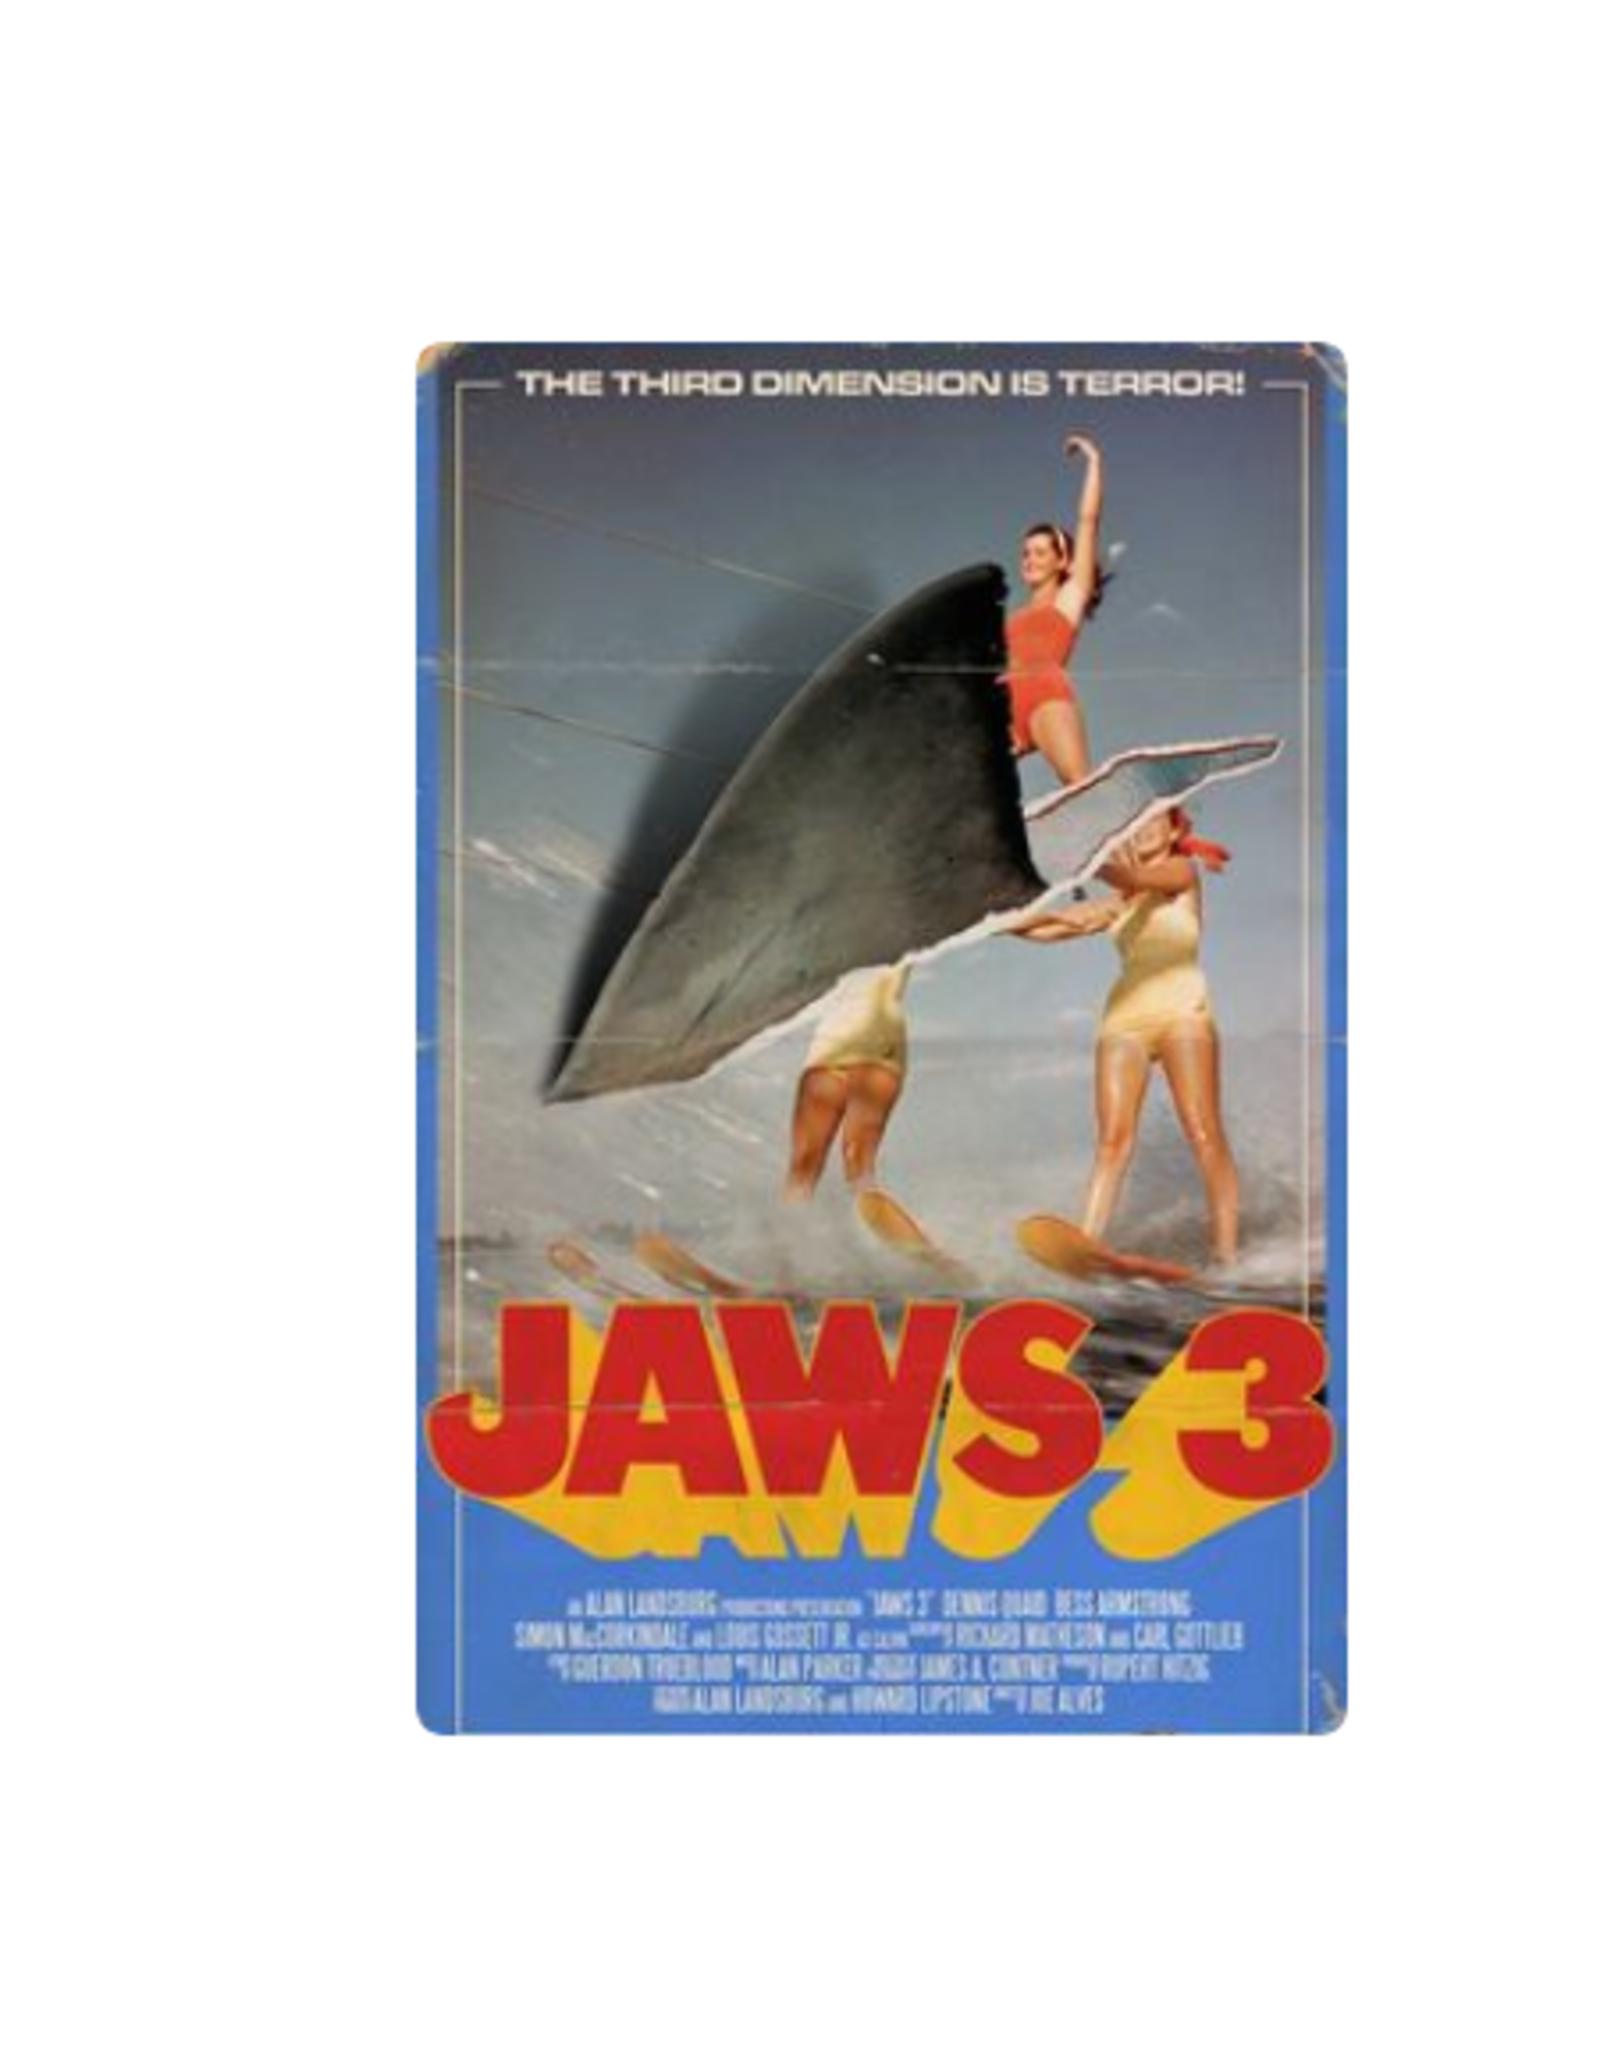 Jaws 3 Movie Print